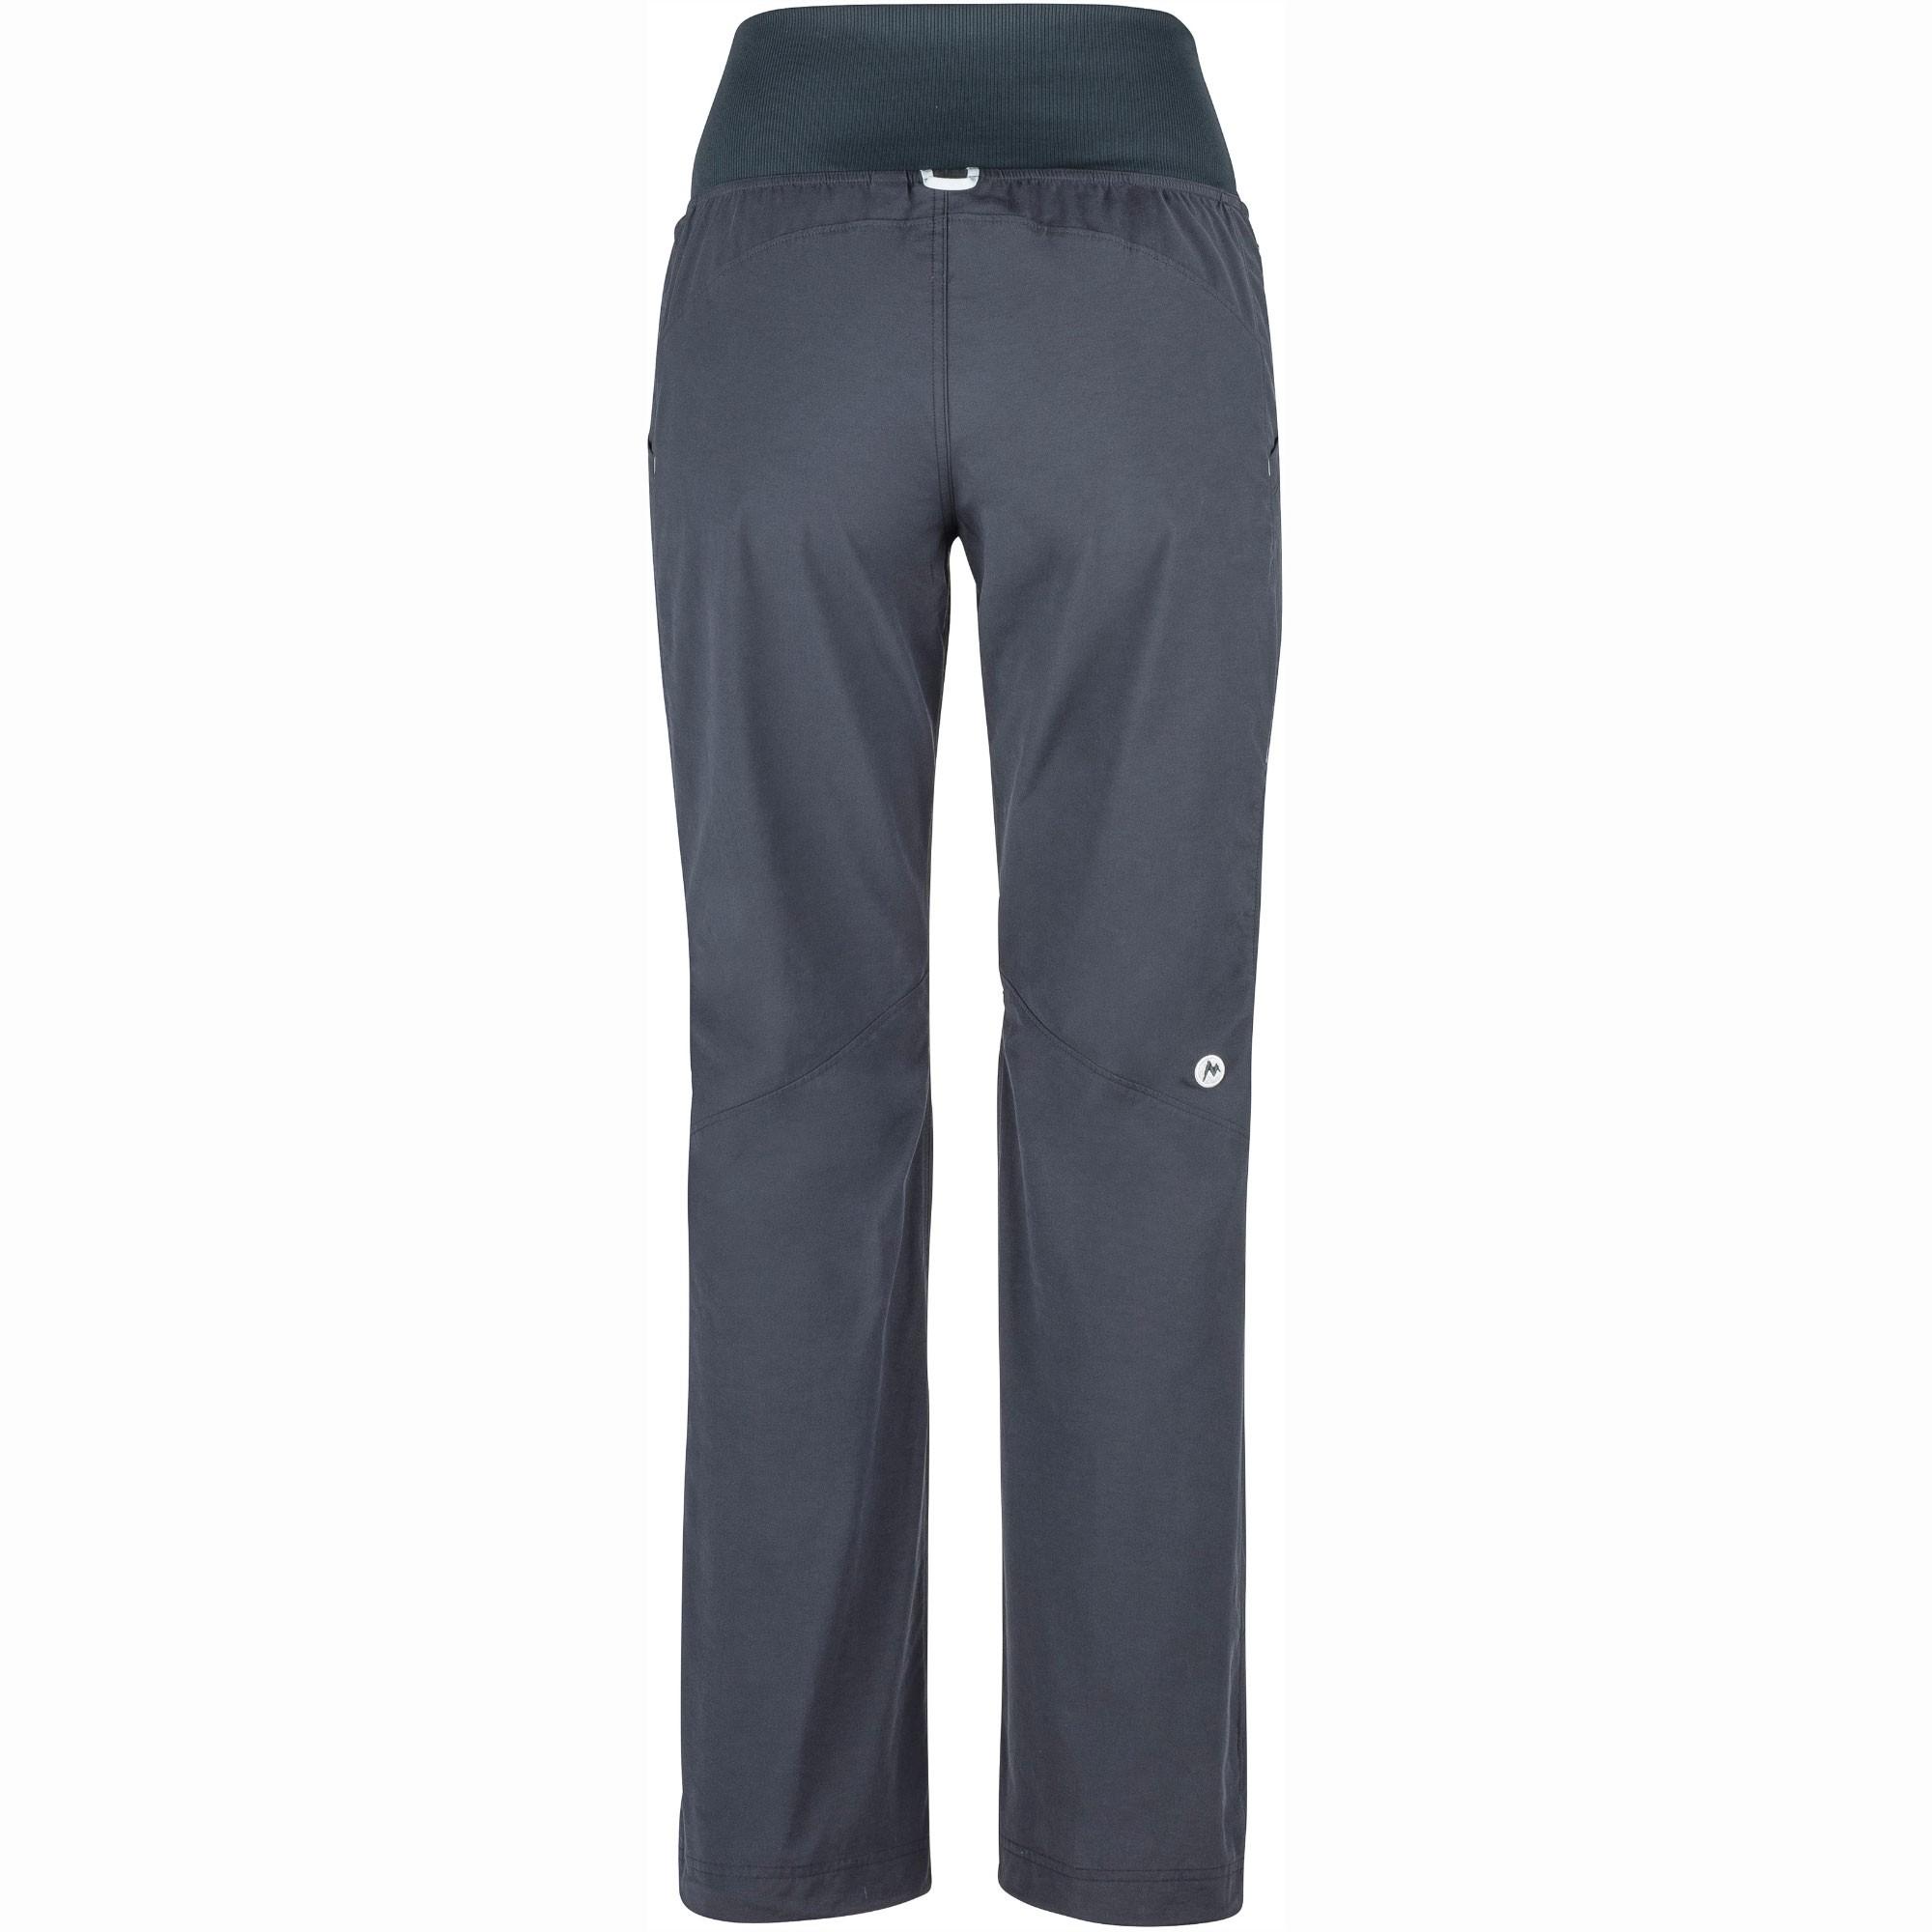 Marmot Lleida Women's Climbing Pants - Dark Steel - Back